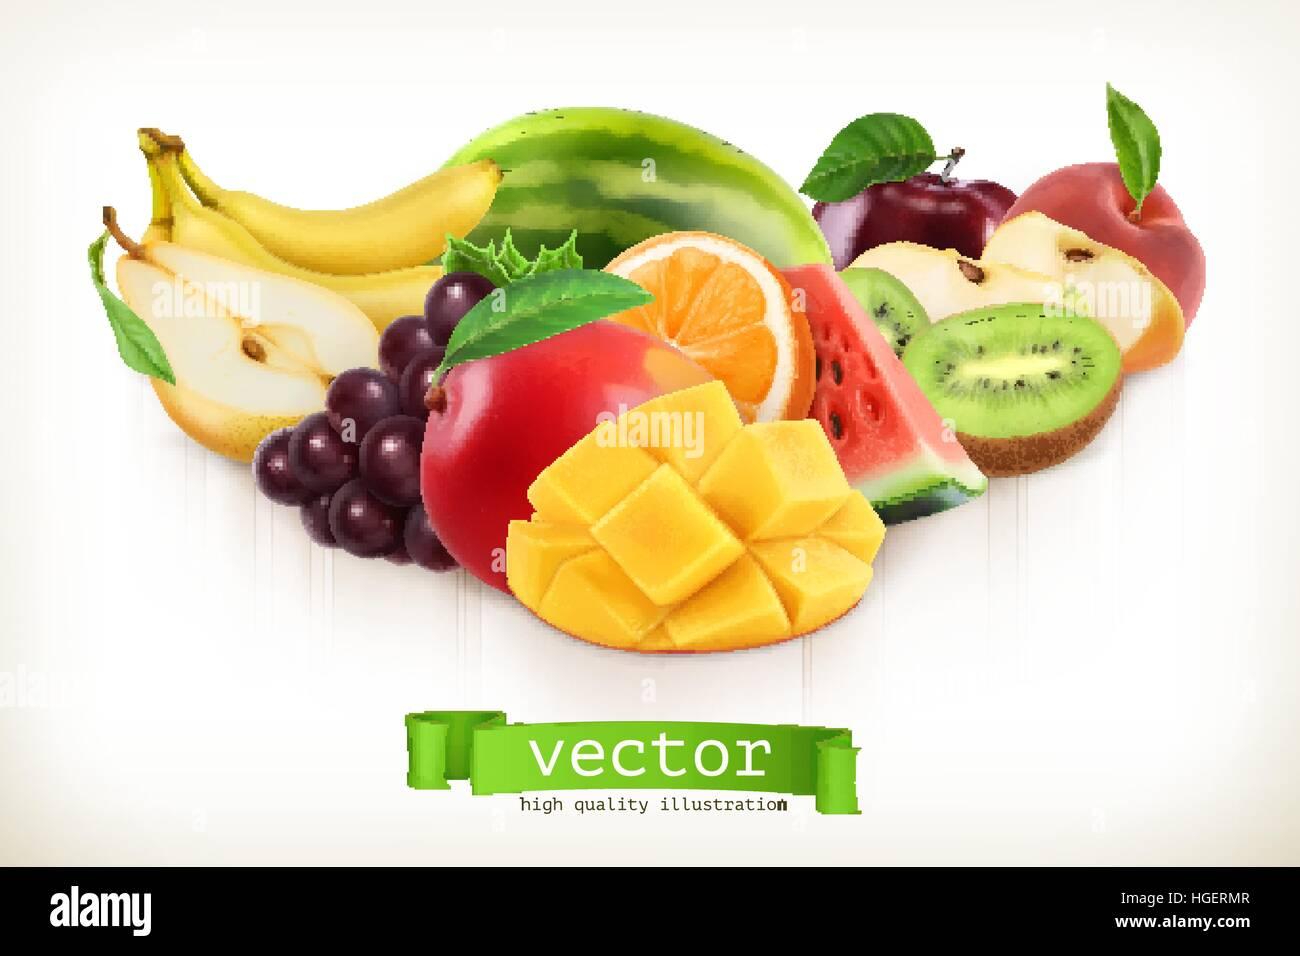 mango and juicy fruits vector illustration isolated on white stock